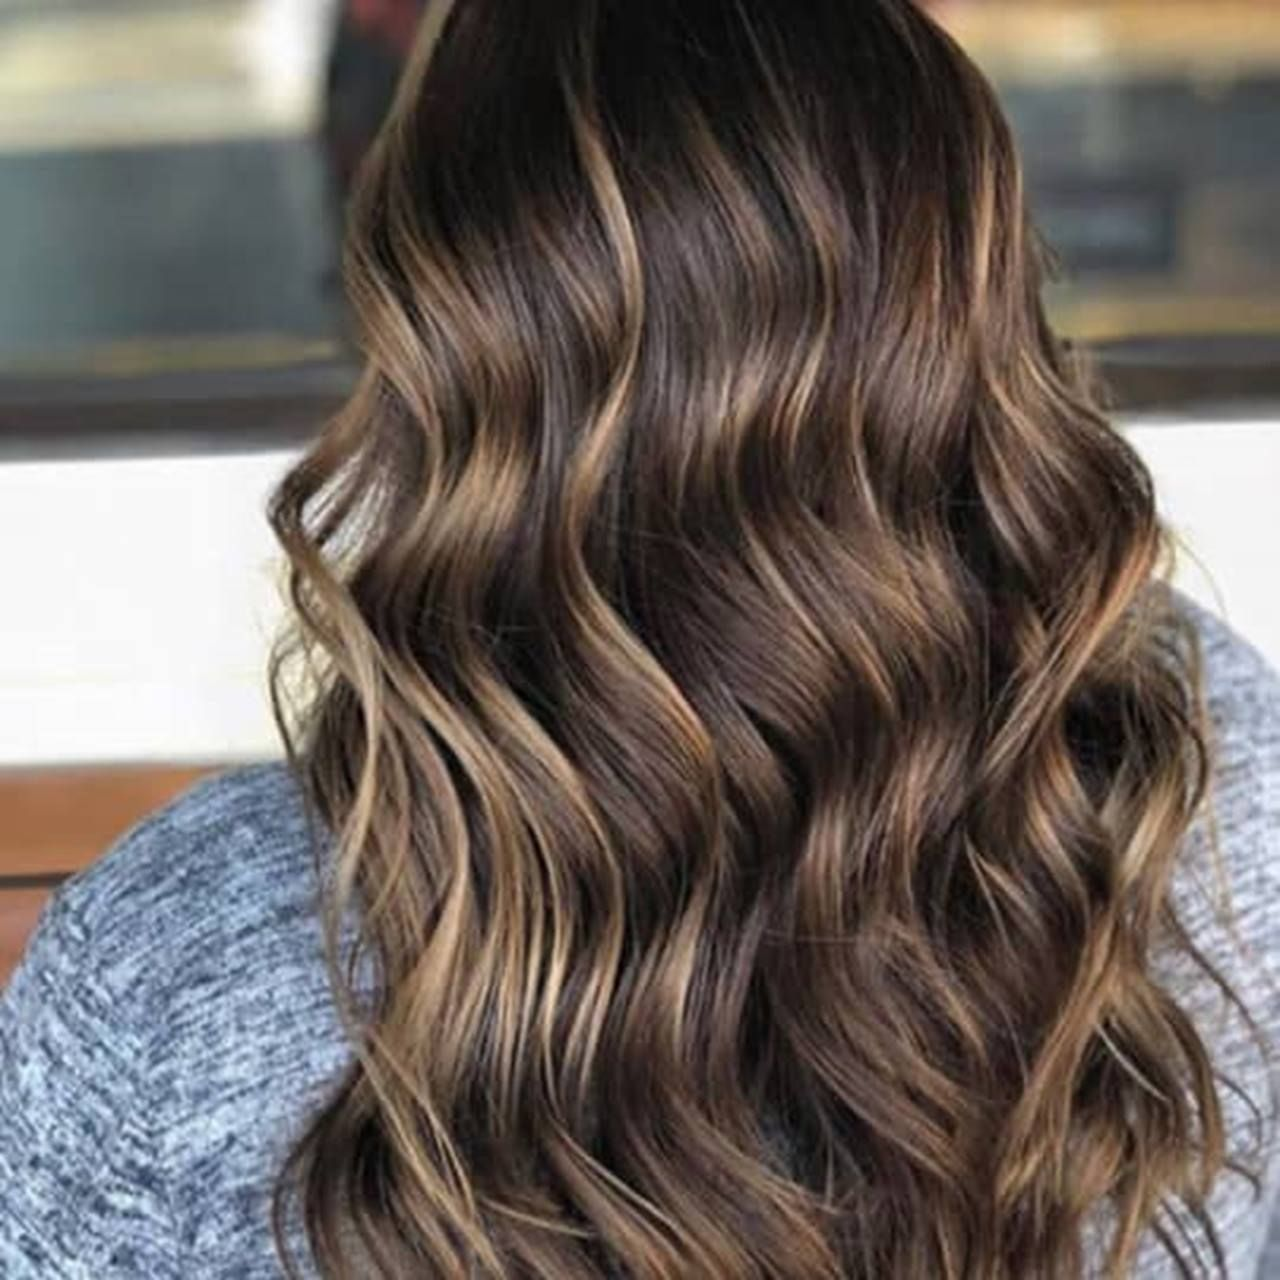 The Best 71 Dark Brown Hair Color Ideas For 2021 Hair Com By L Oreal Brown Hair Honey Highlights Brown Blonde Hair Brown Hair Balayage